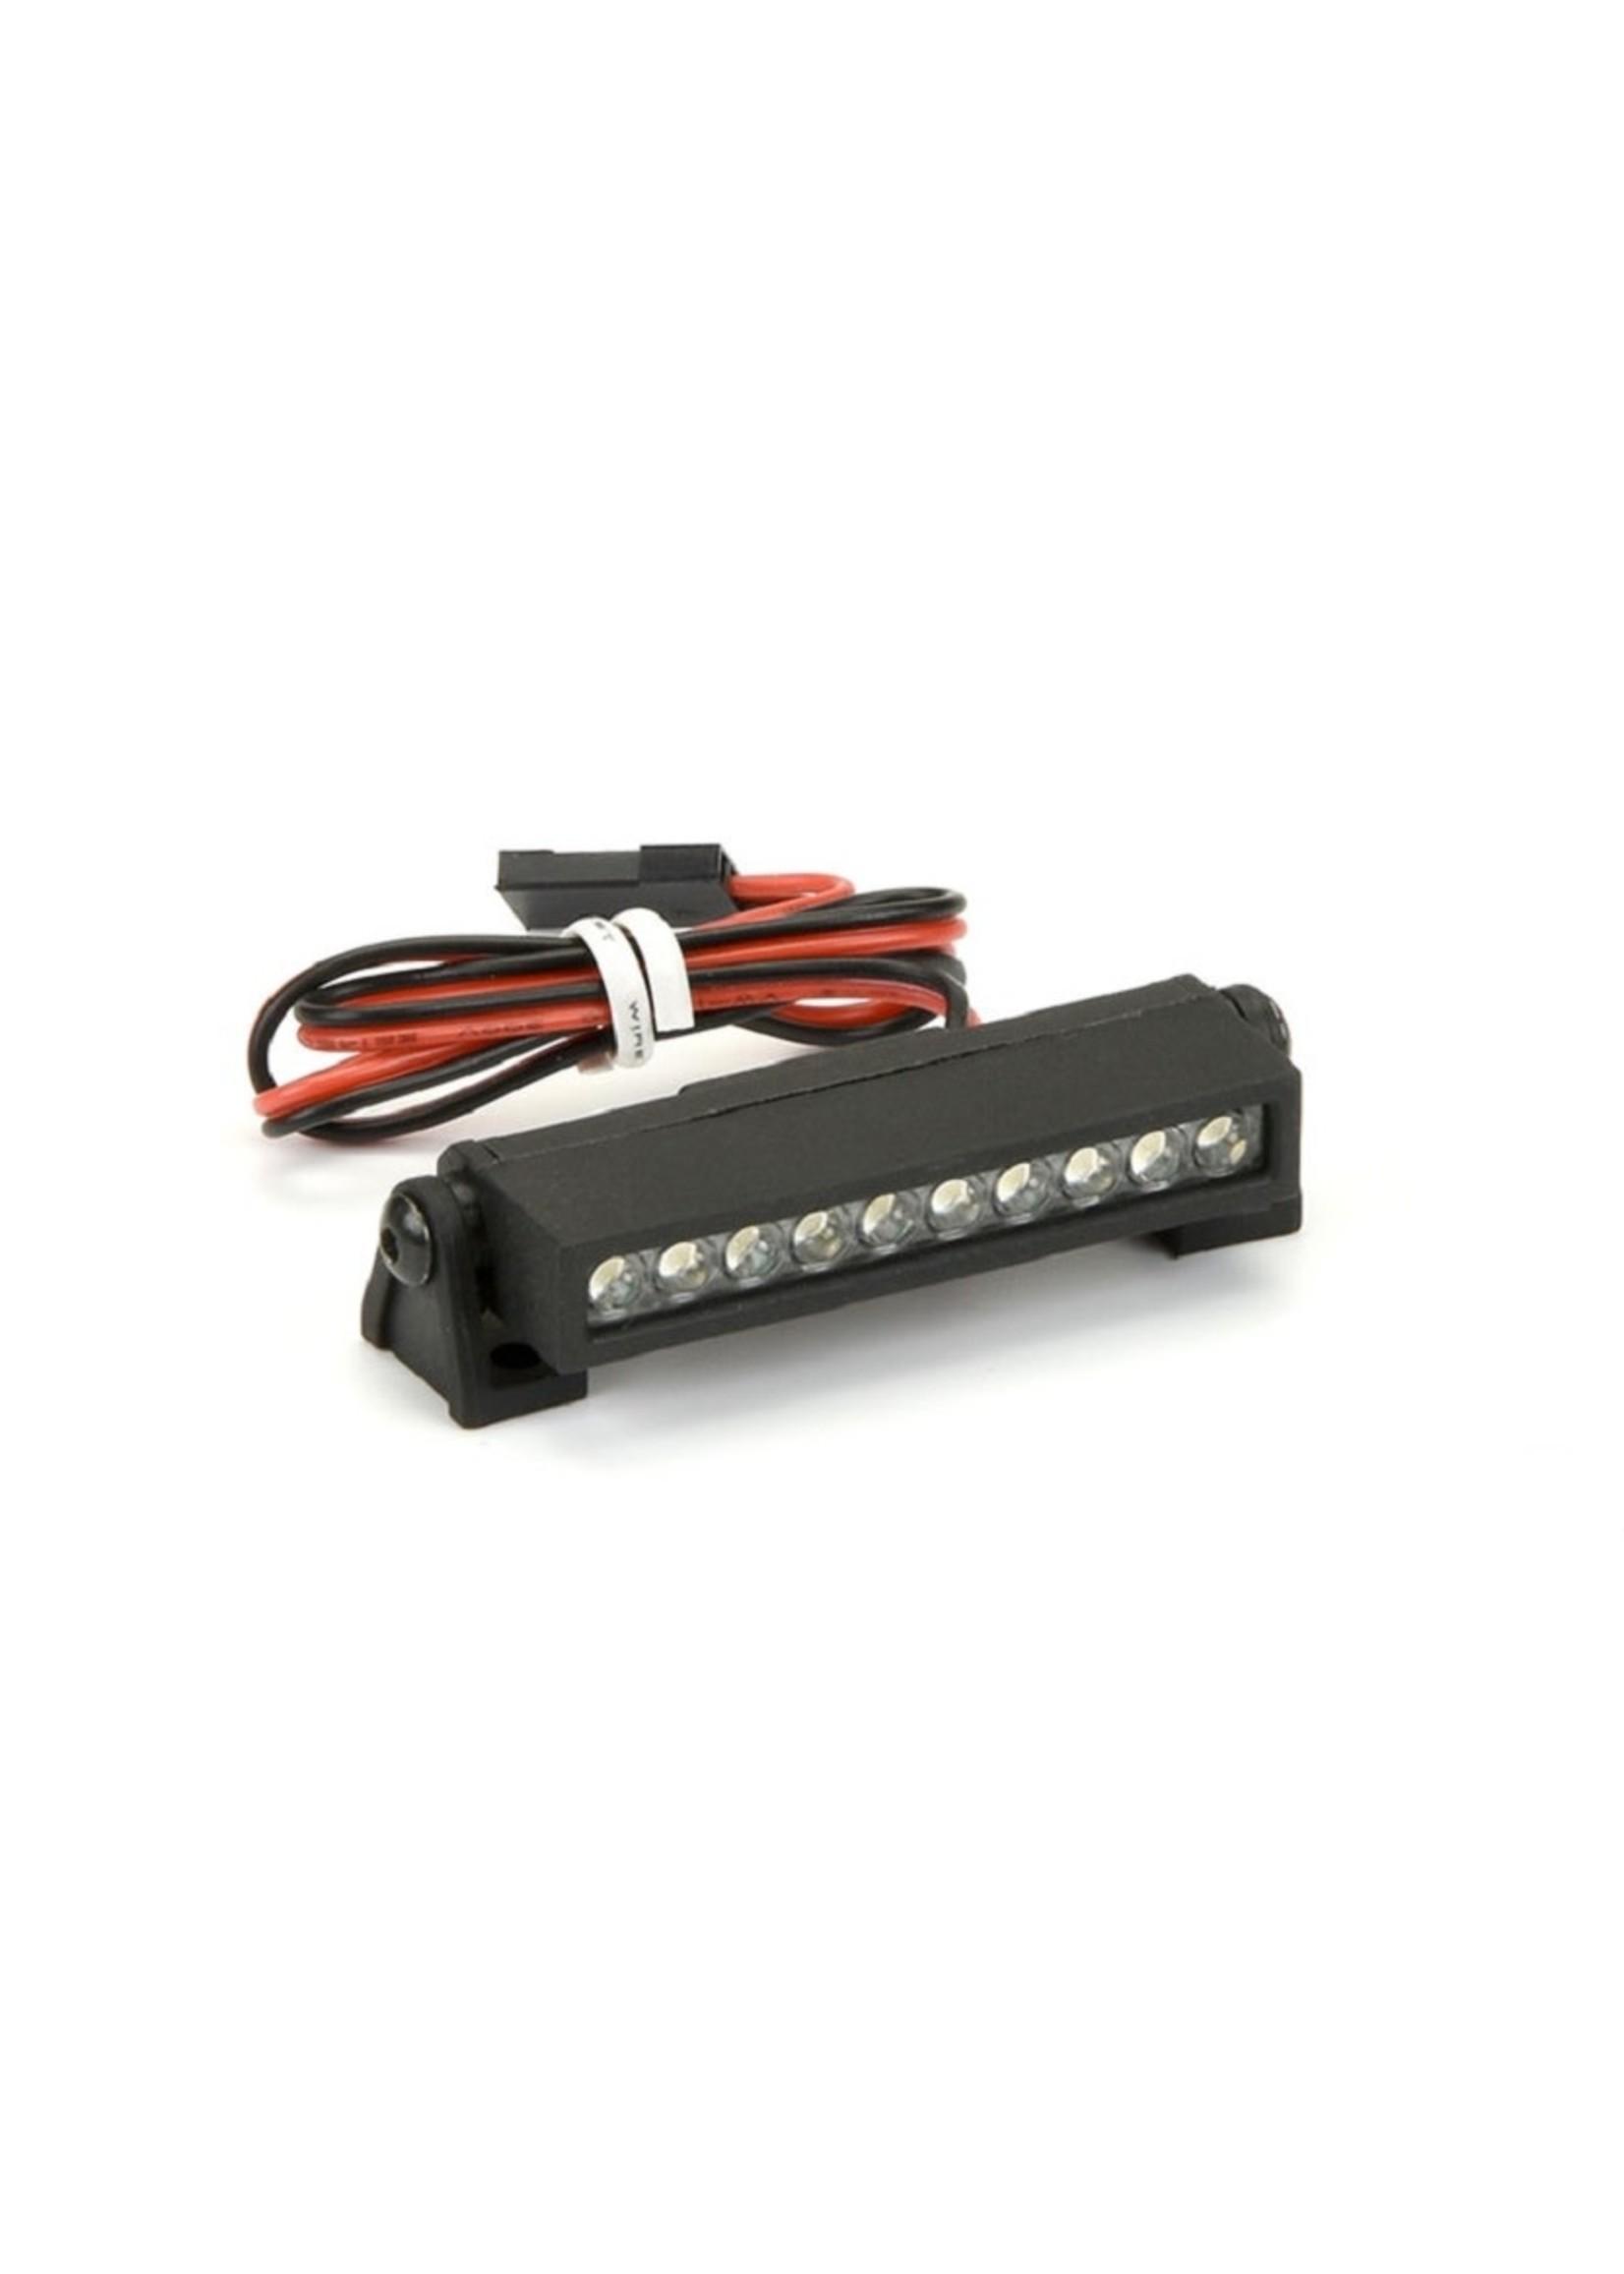 Pro-Line Racing PRO6276-00 Pro-Line 2'' Super-Bright LED Light Bar Kit 6V-12V, Straight